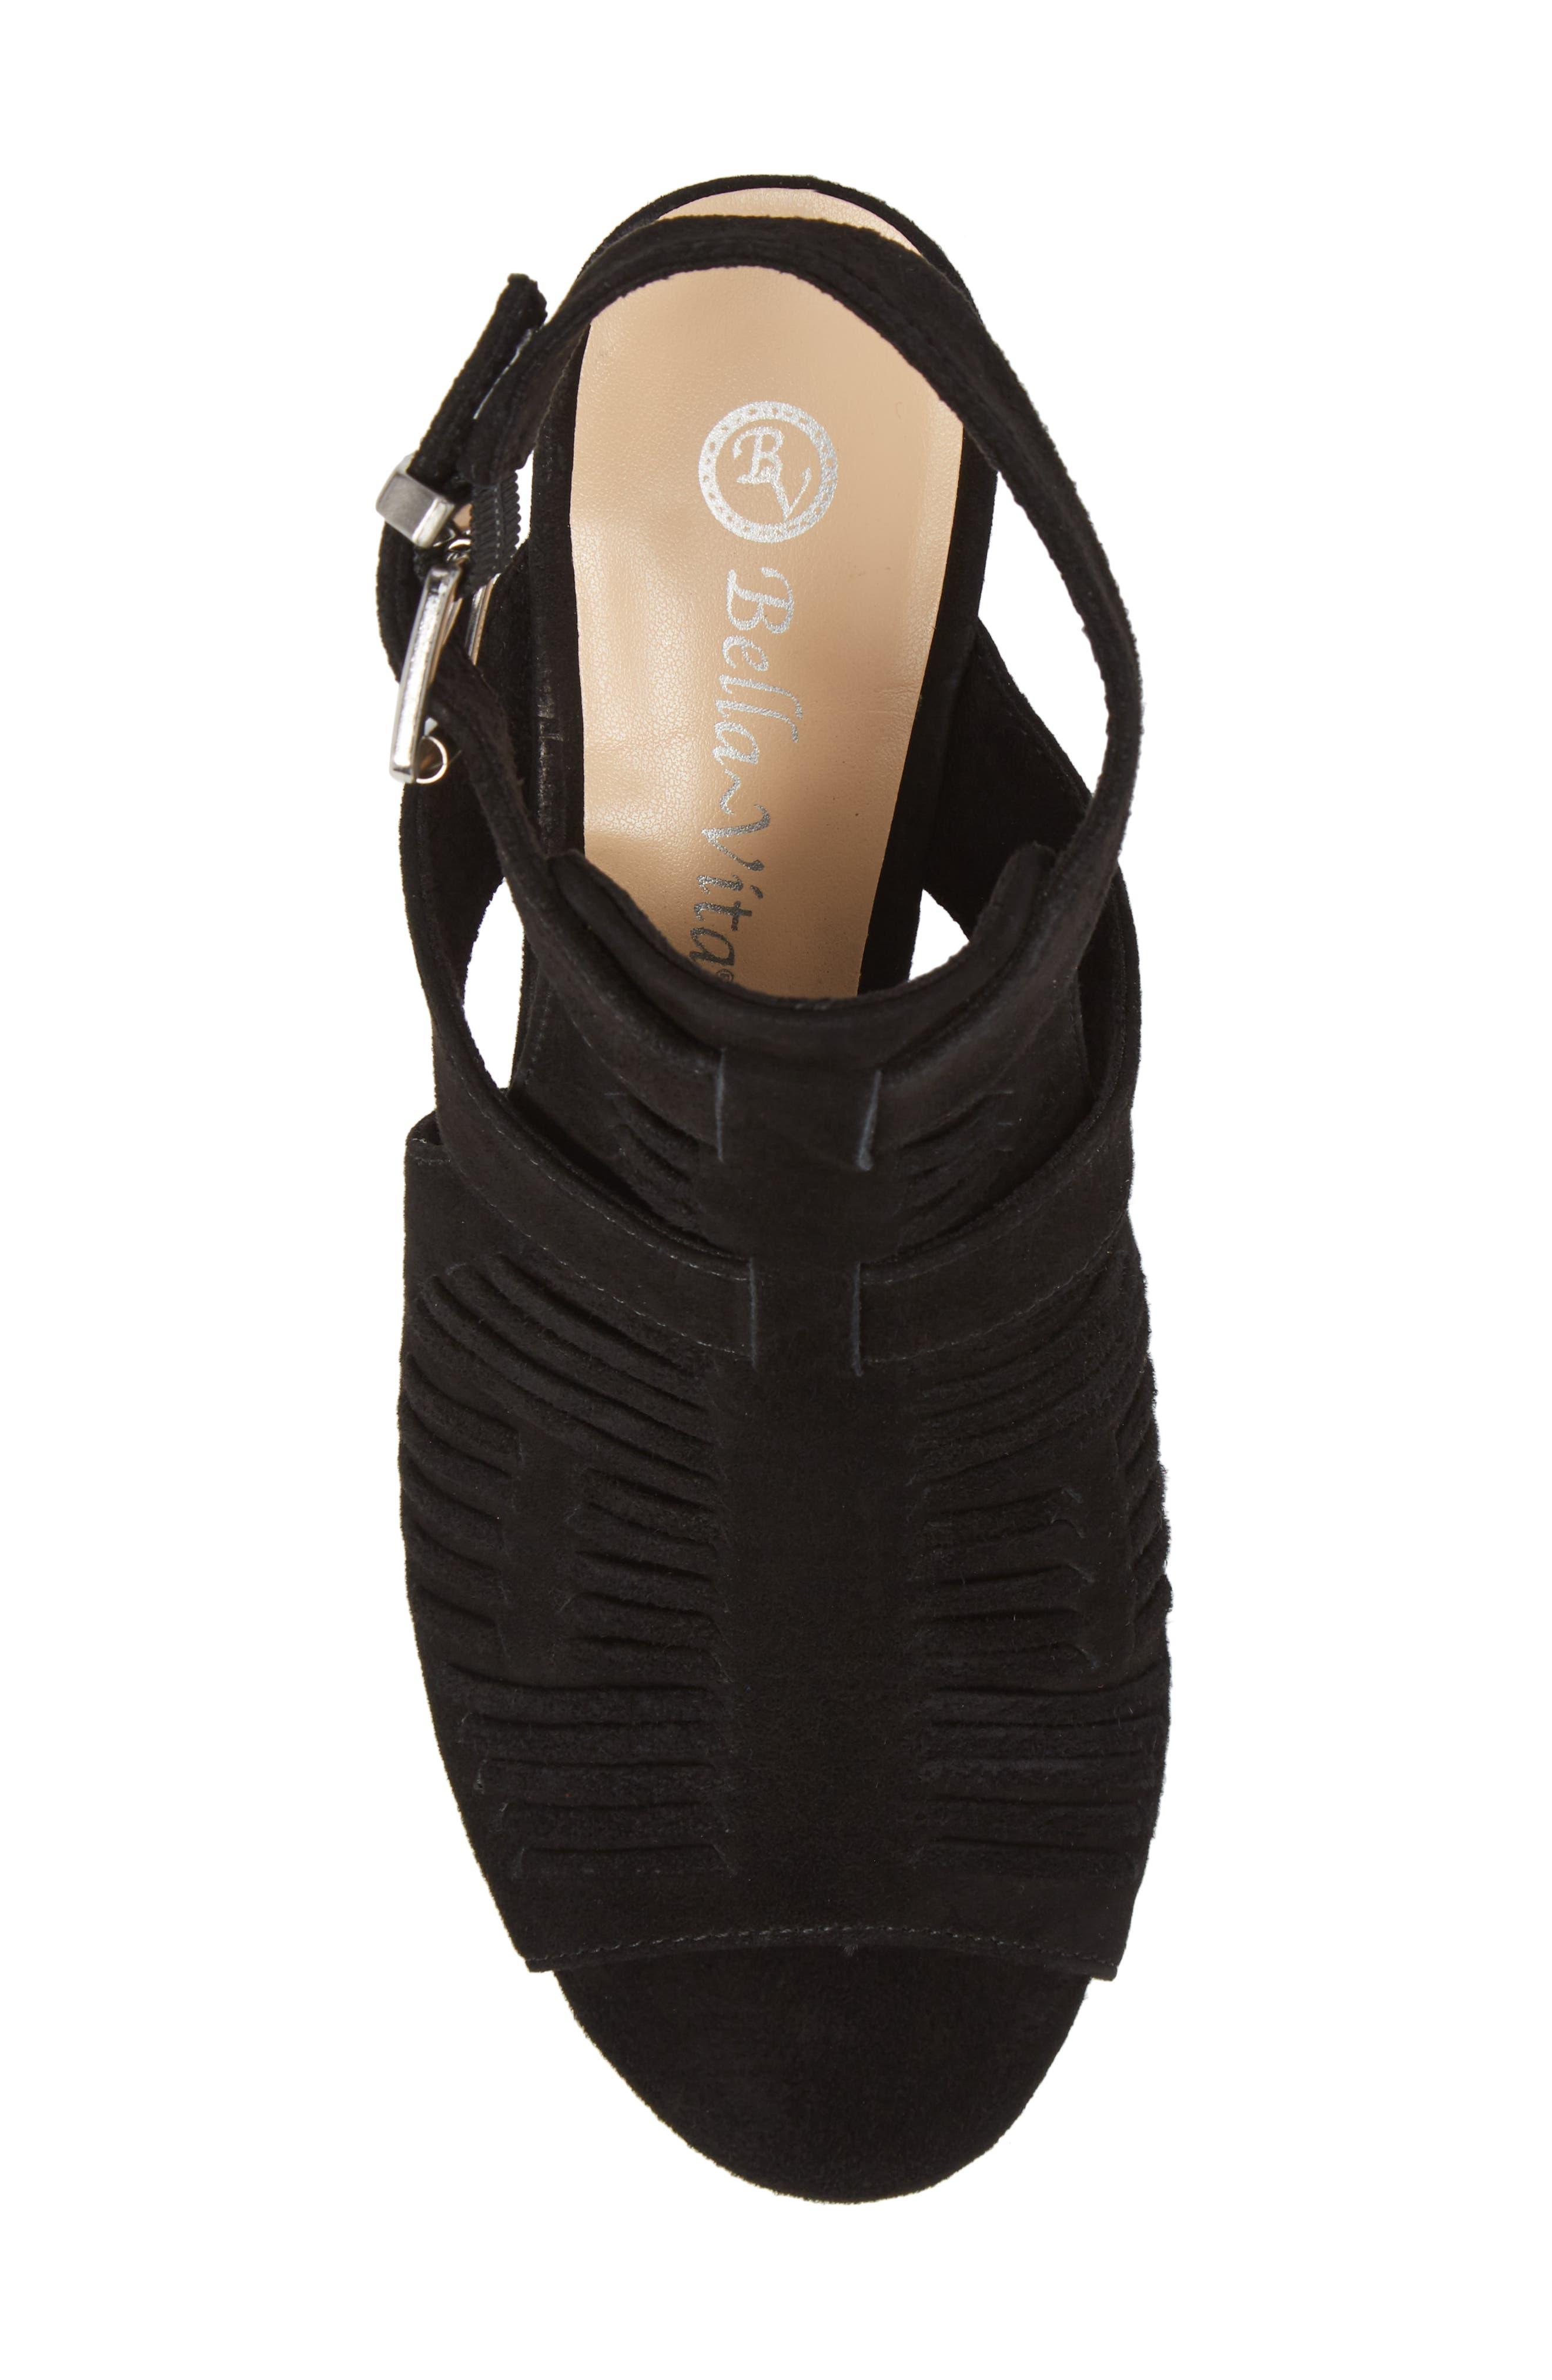 Finley Ankle Strap Sandal,                             Alternate thumbnail 5, color,                             Black Suede